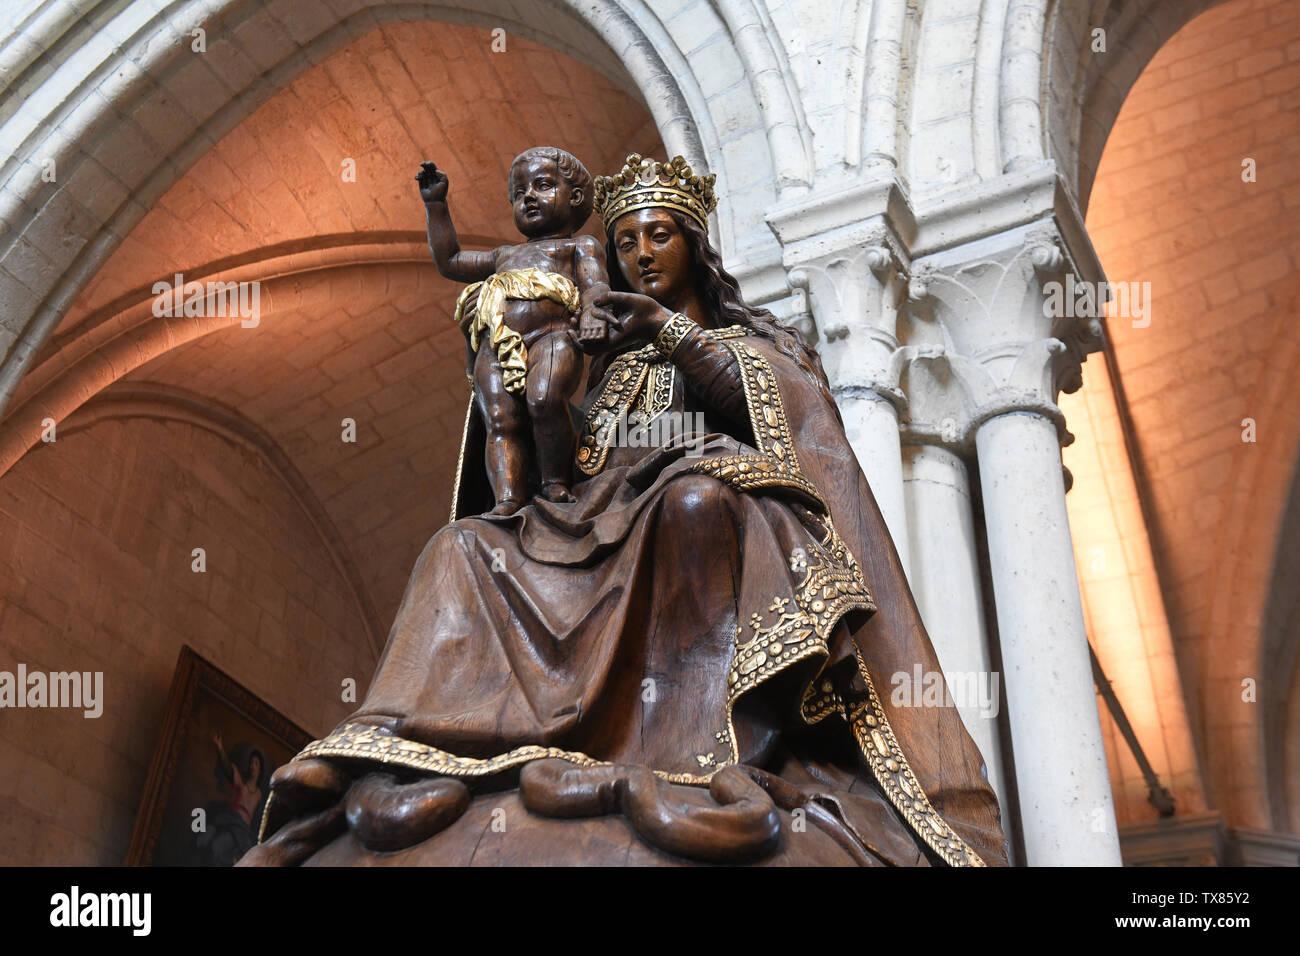 The Madonna and Child statue at Cathedrale Notre-Dame de Laon Laon, Aisne, Hauts-de-France, France Stock Photo